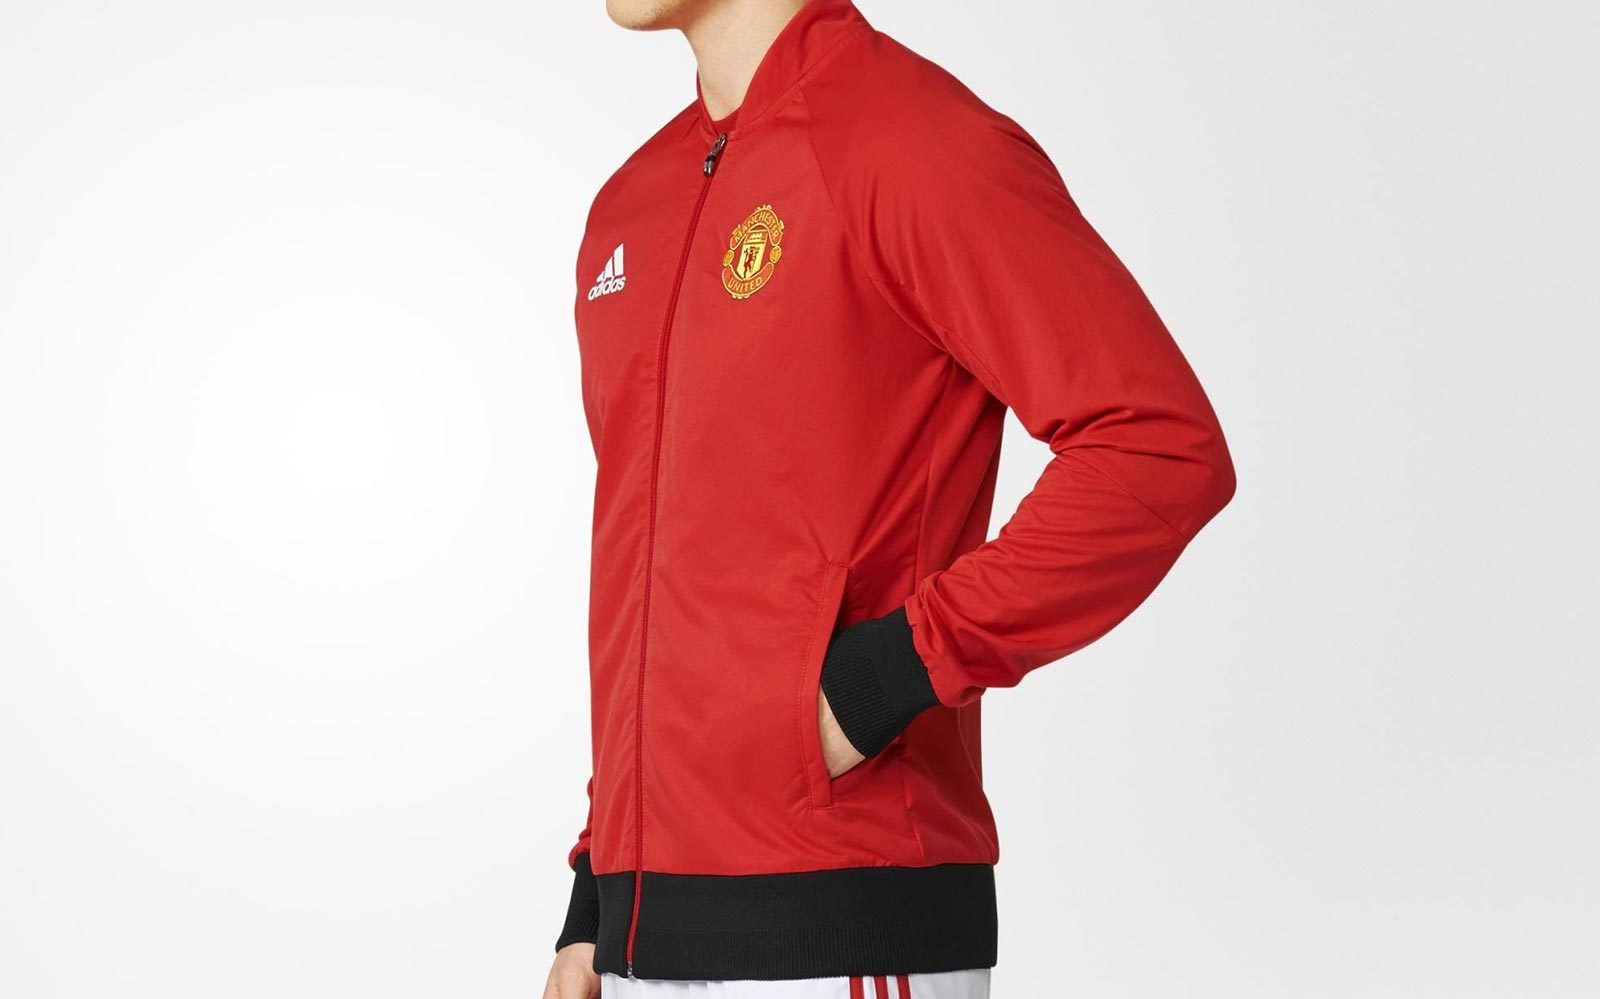 64b37a2529a Adidas Manchester United 2016 Anthem Jacket Leaked - Sports kicks